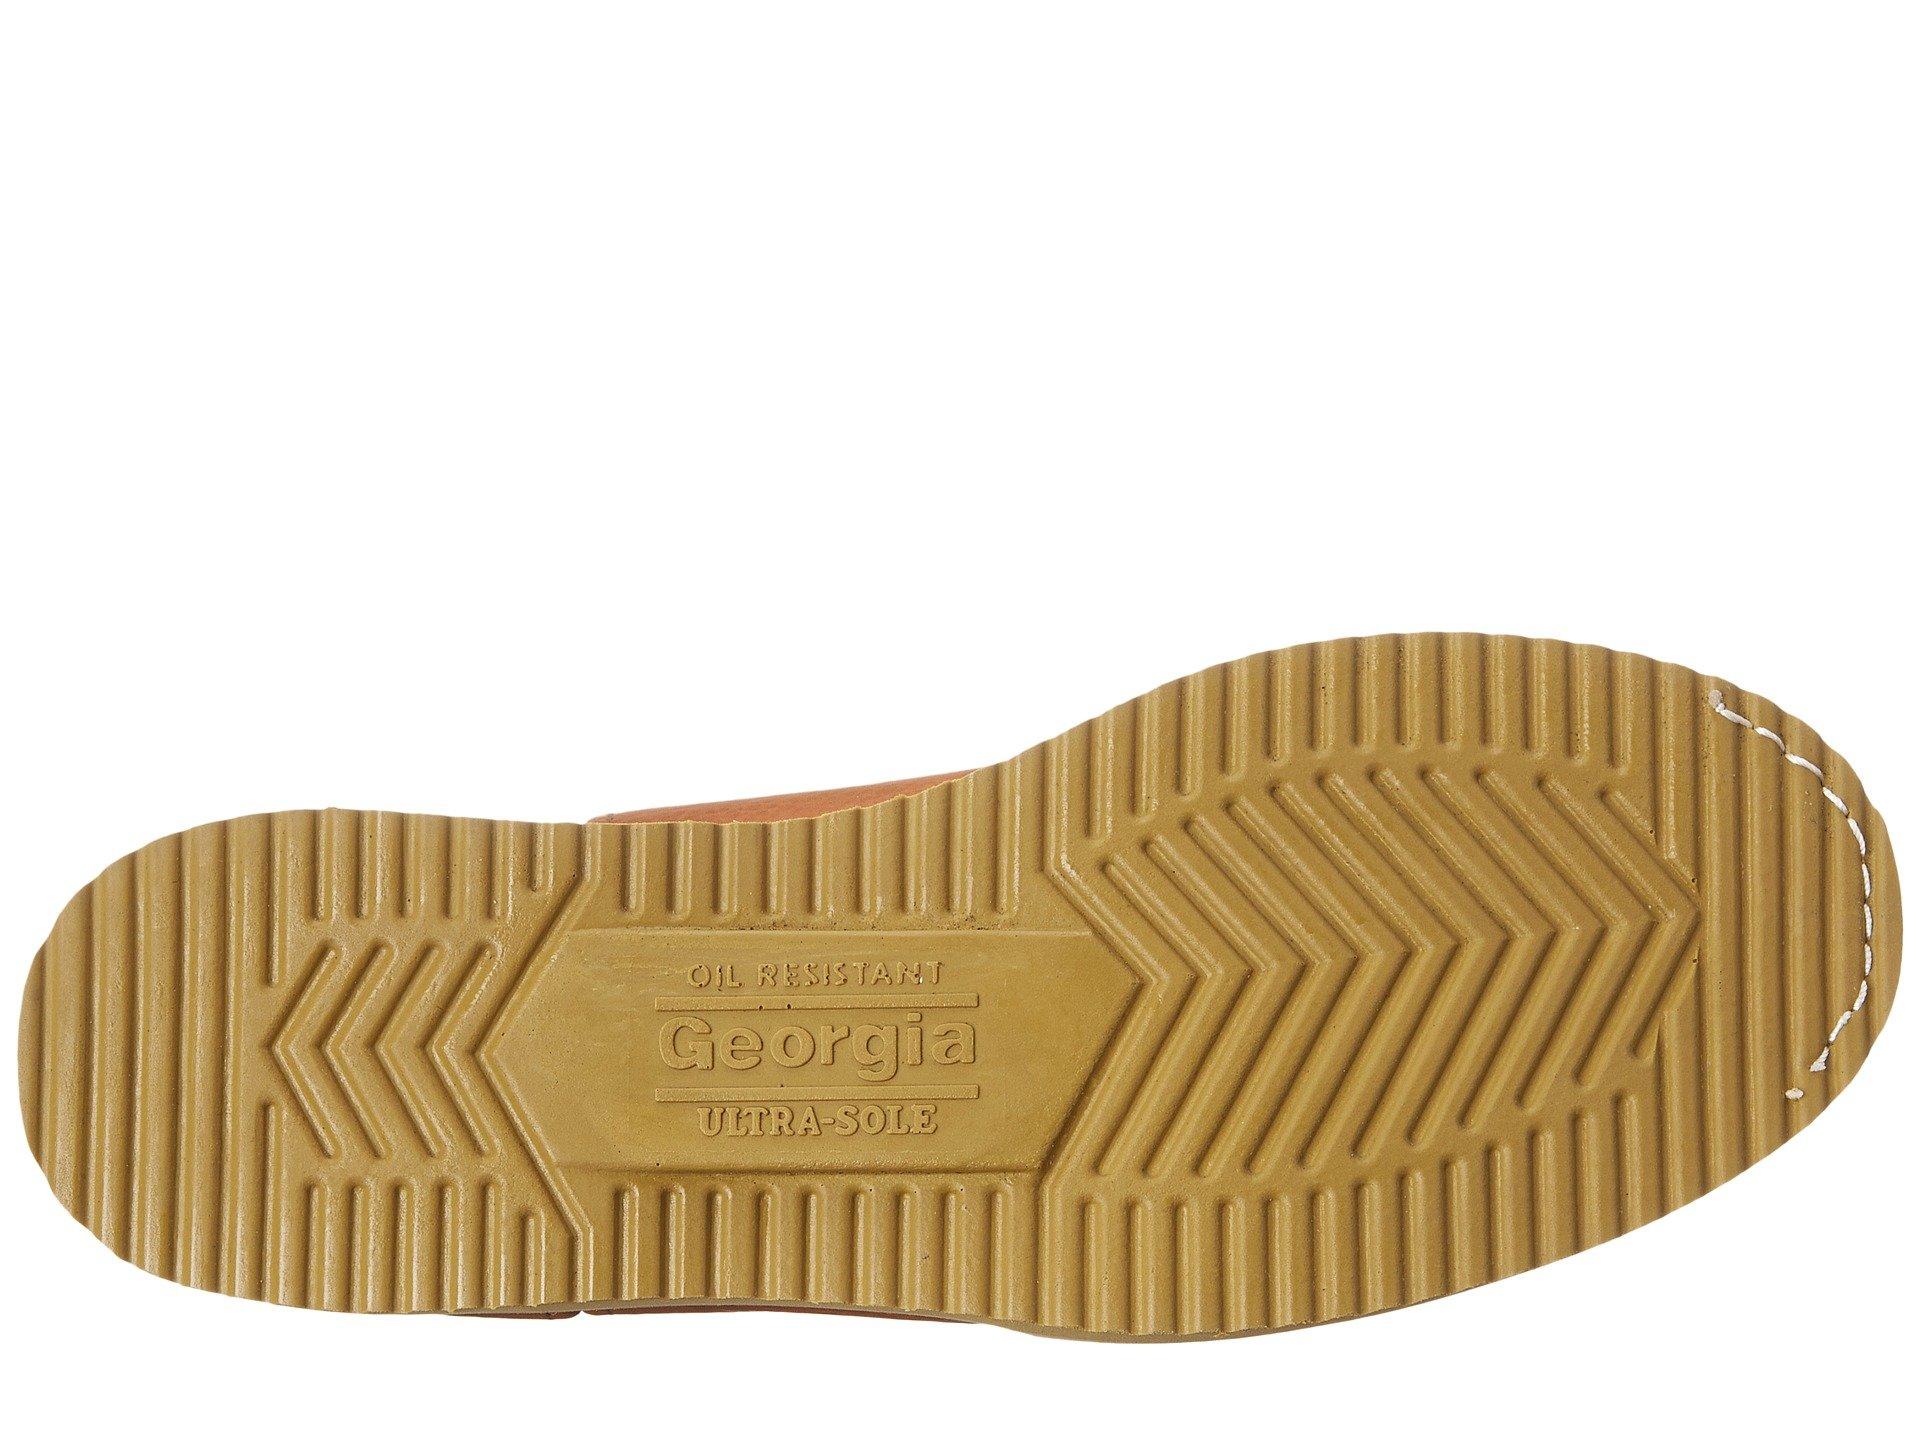 Wellington Georgia G5153 Gold 12